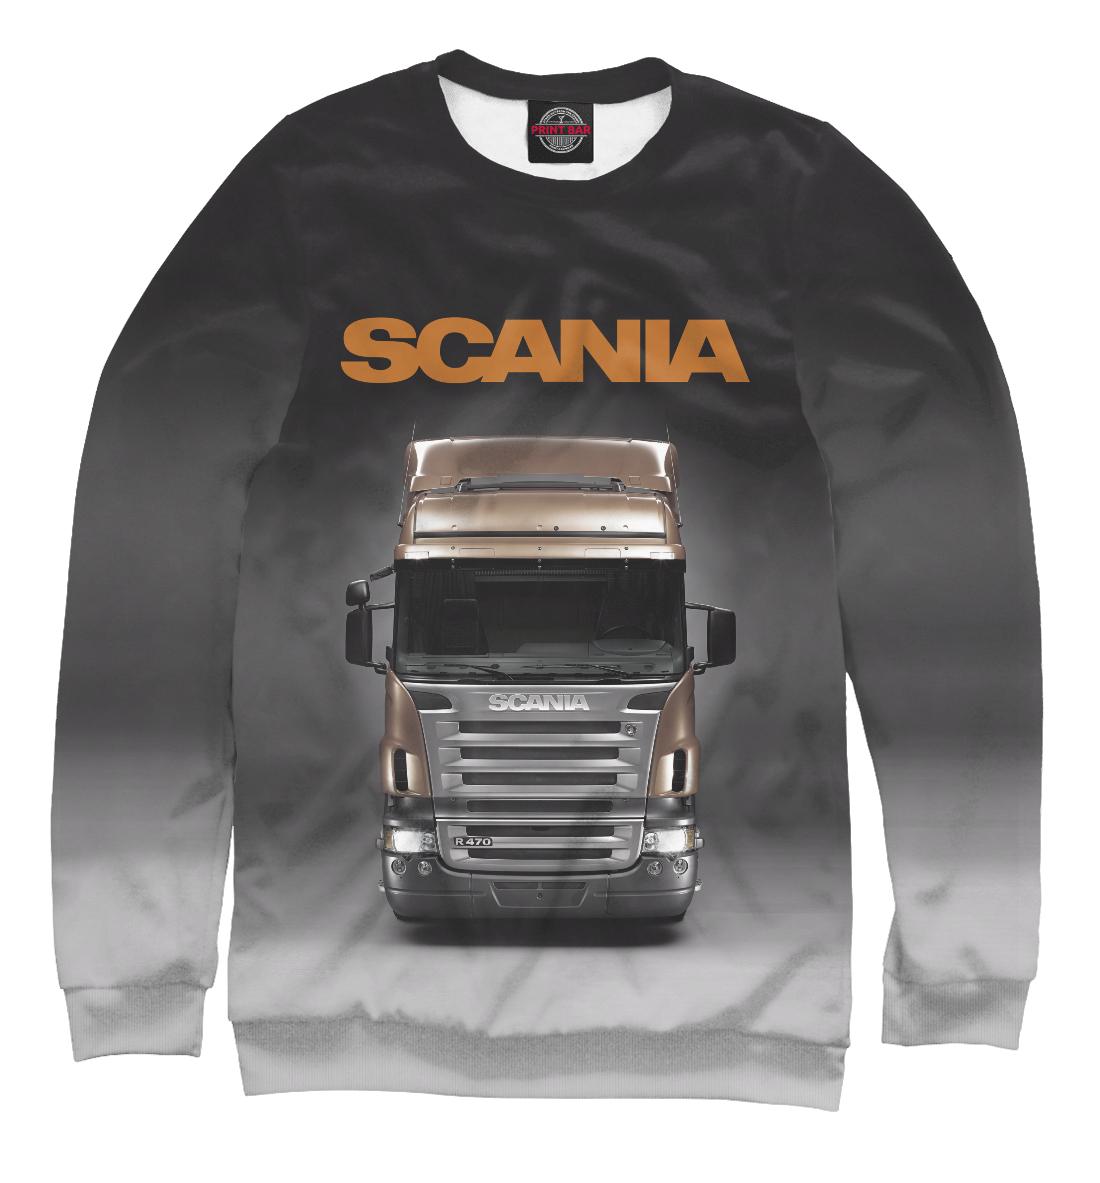 Купить Scania, Printbar, Свитшоты, GRZ-365795-swi-1